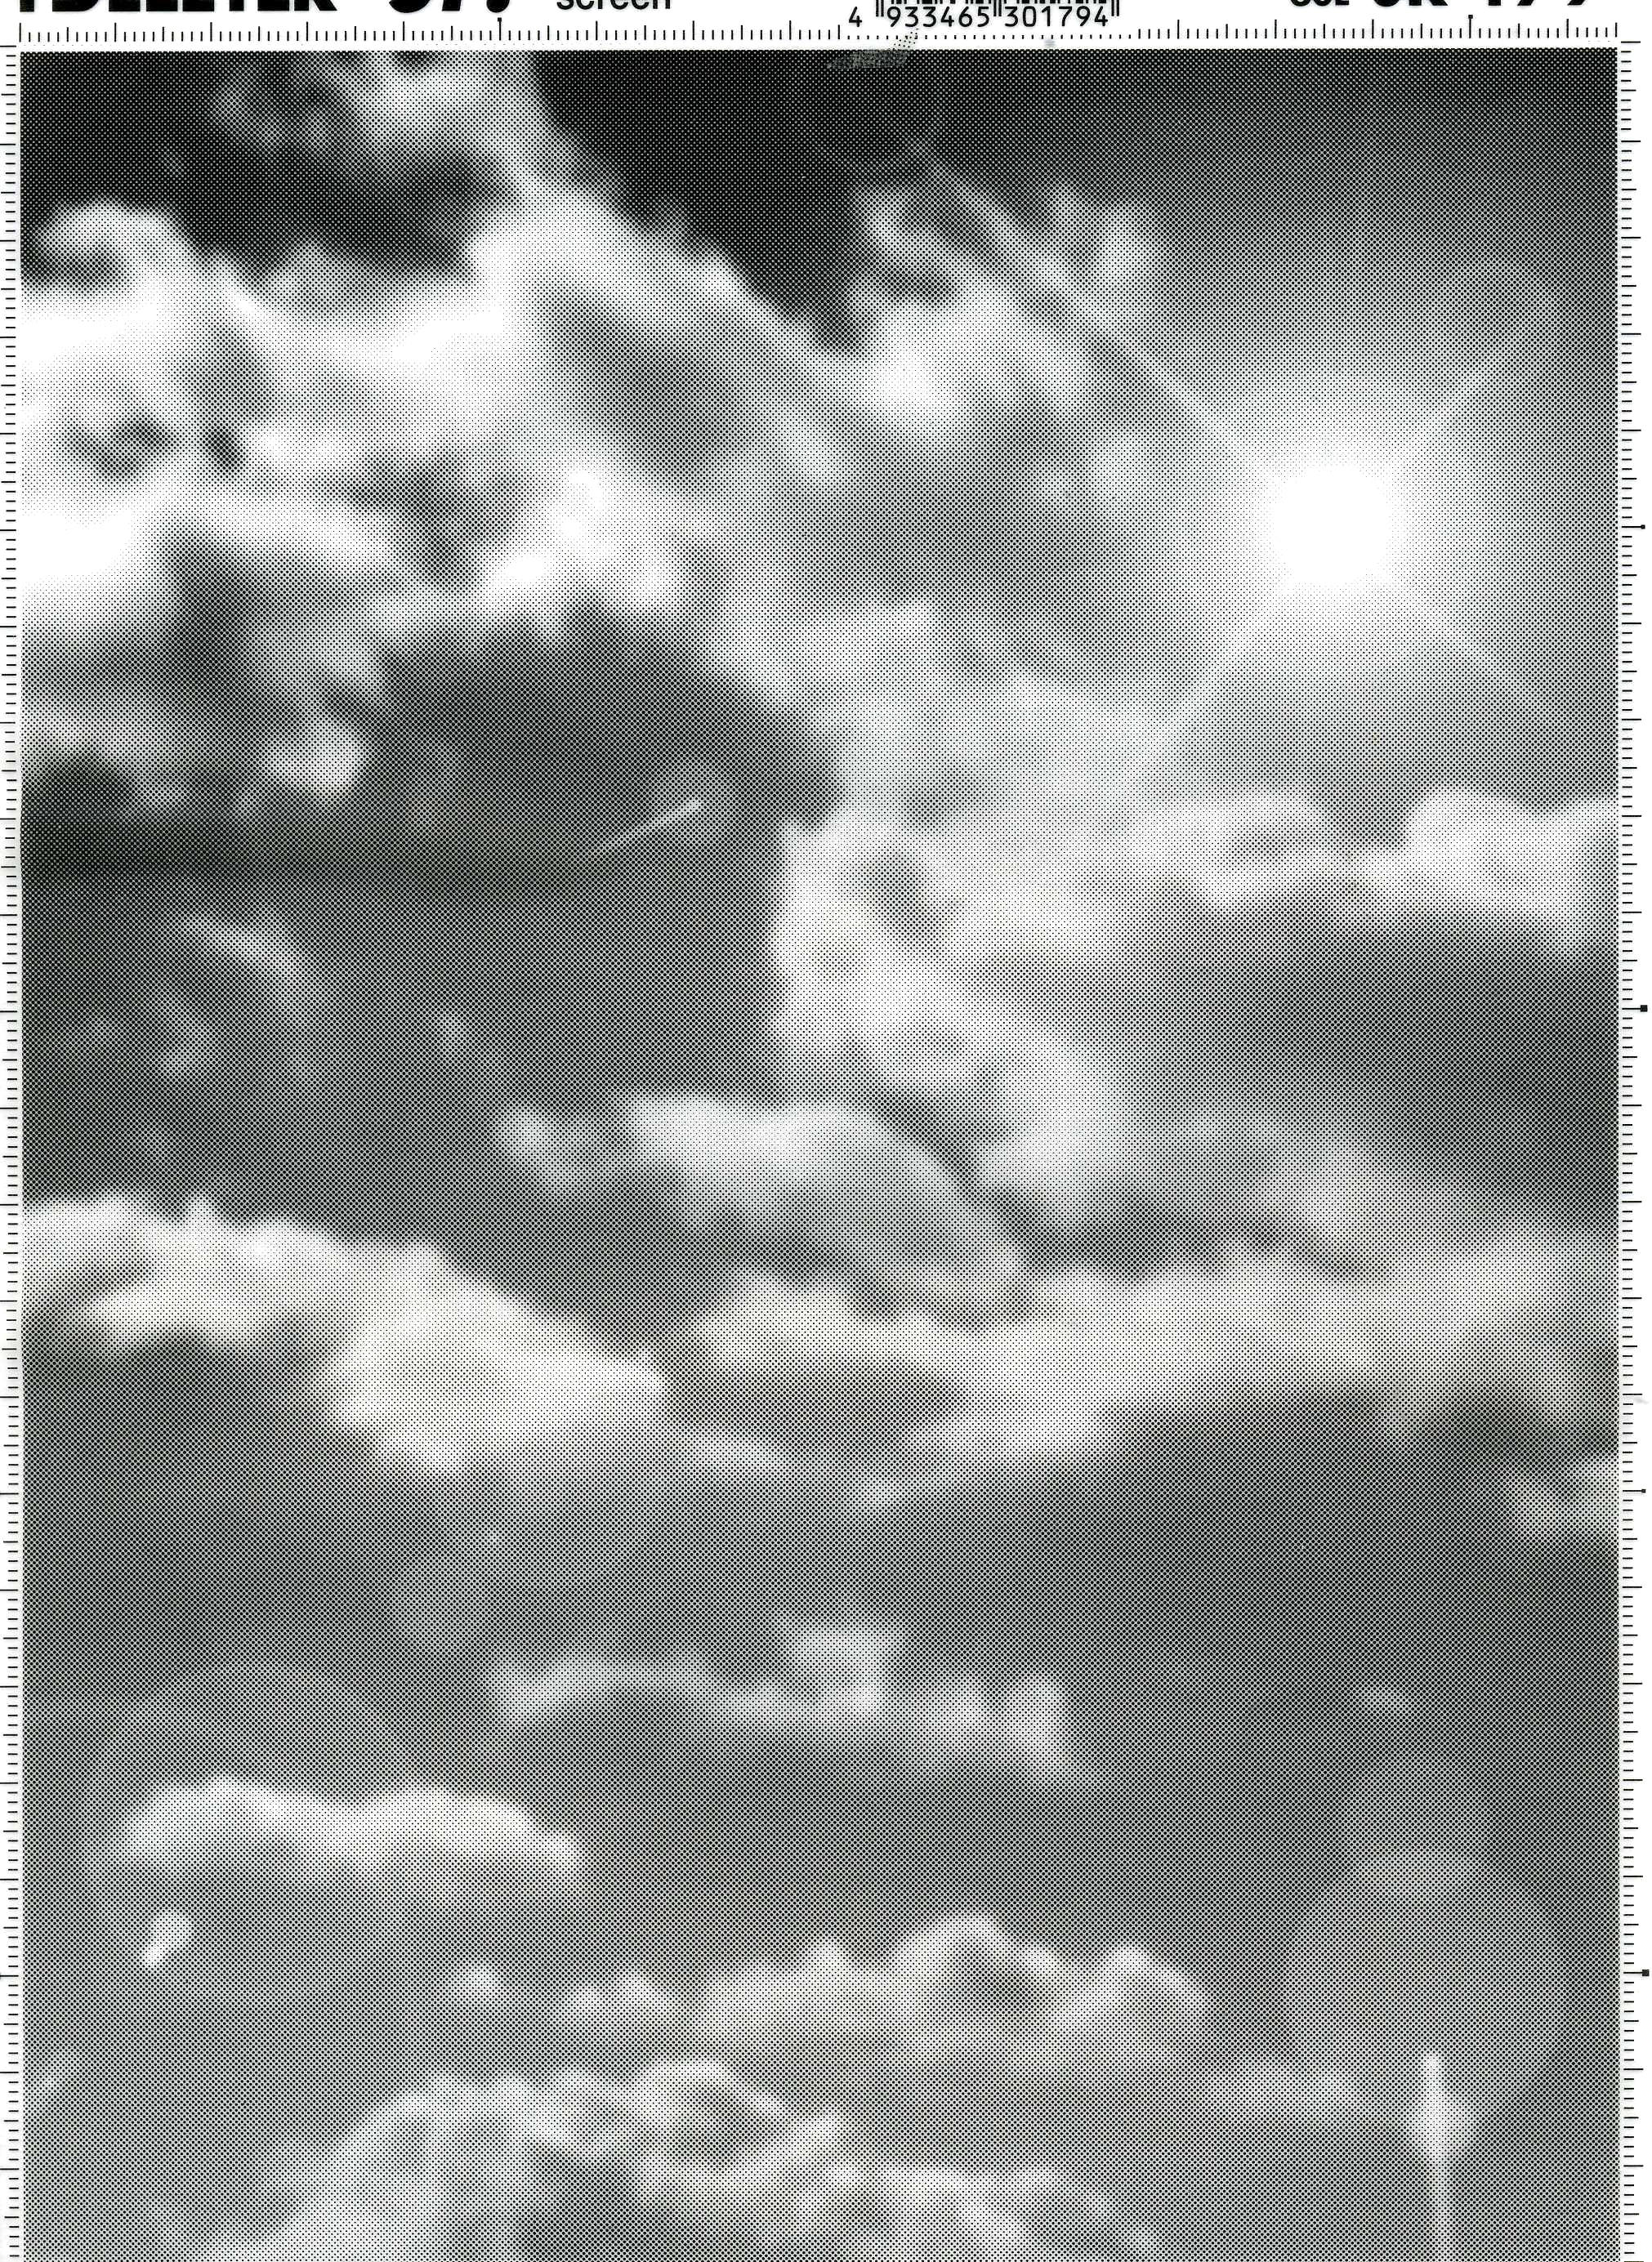 clouds 1 by screentone on DeviantArt